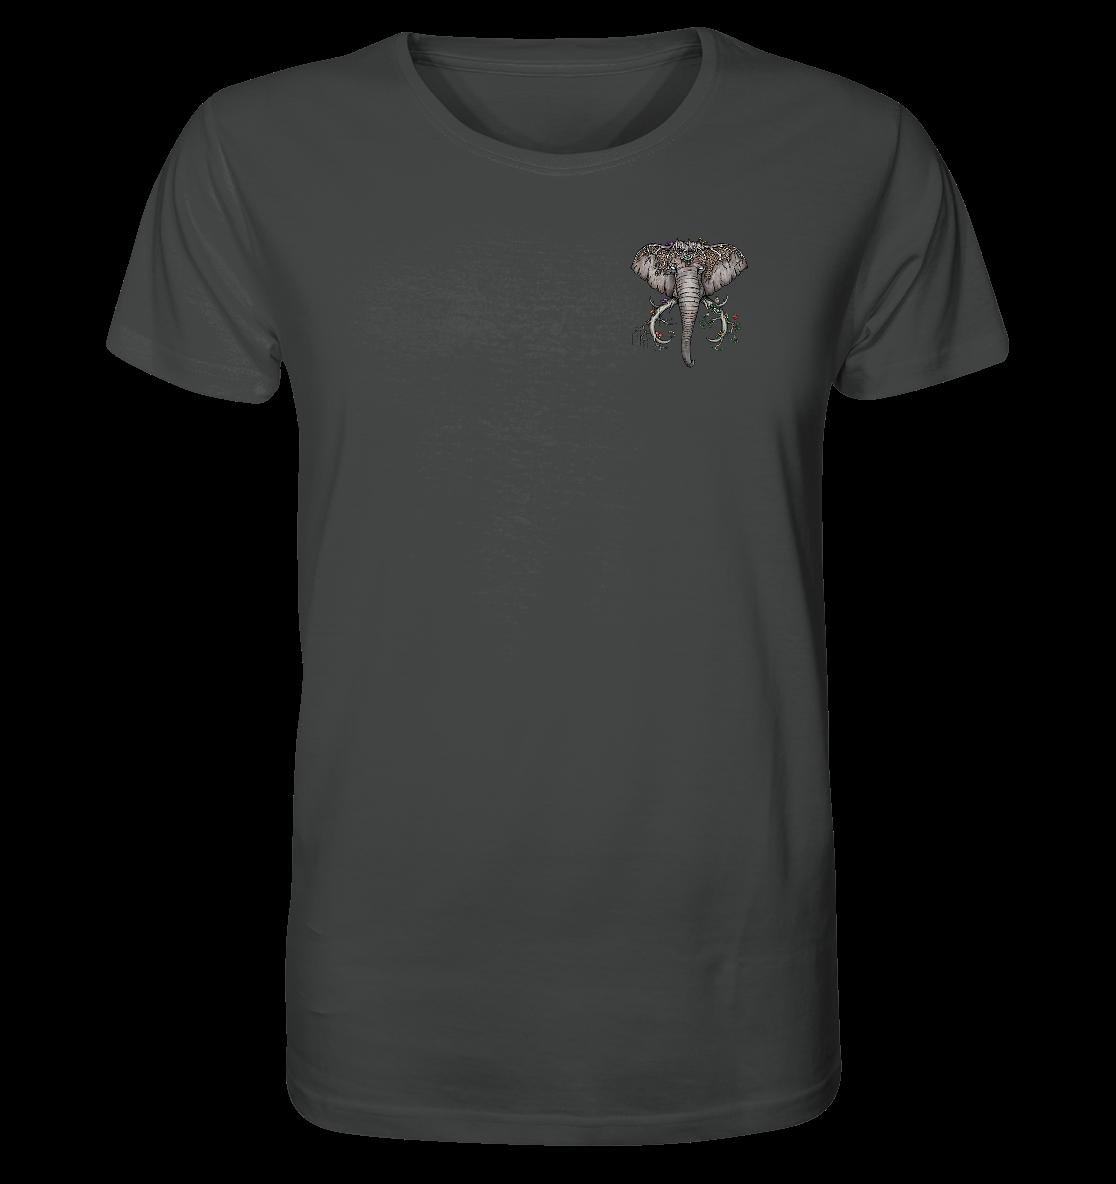 front-organic-shirt-444545-1116x-3.png